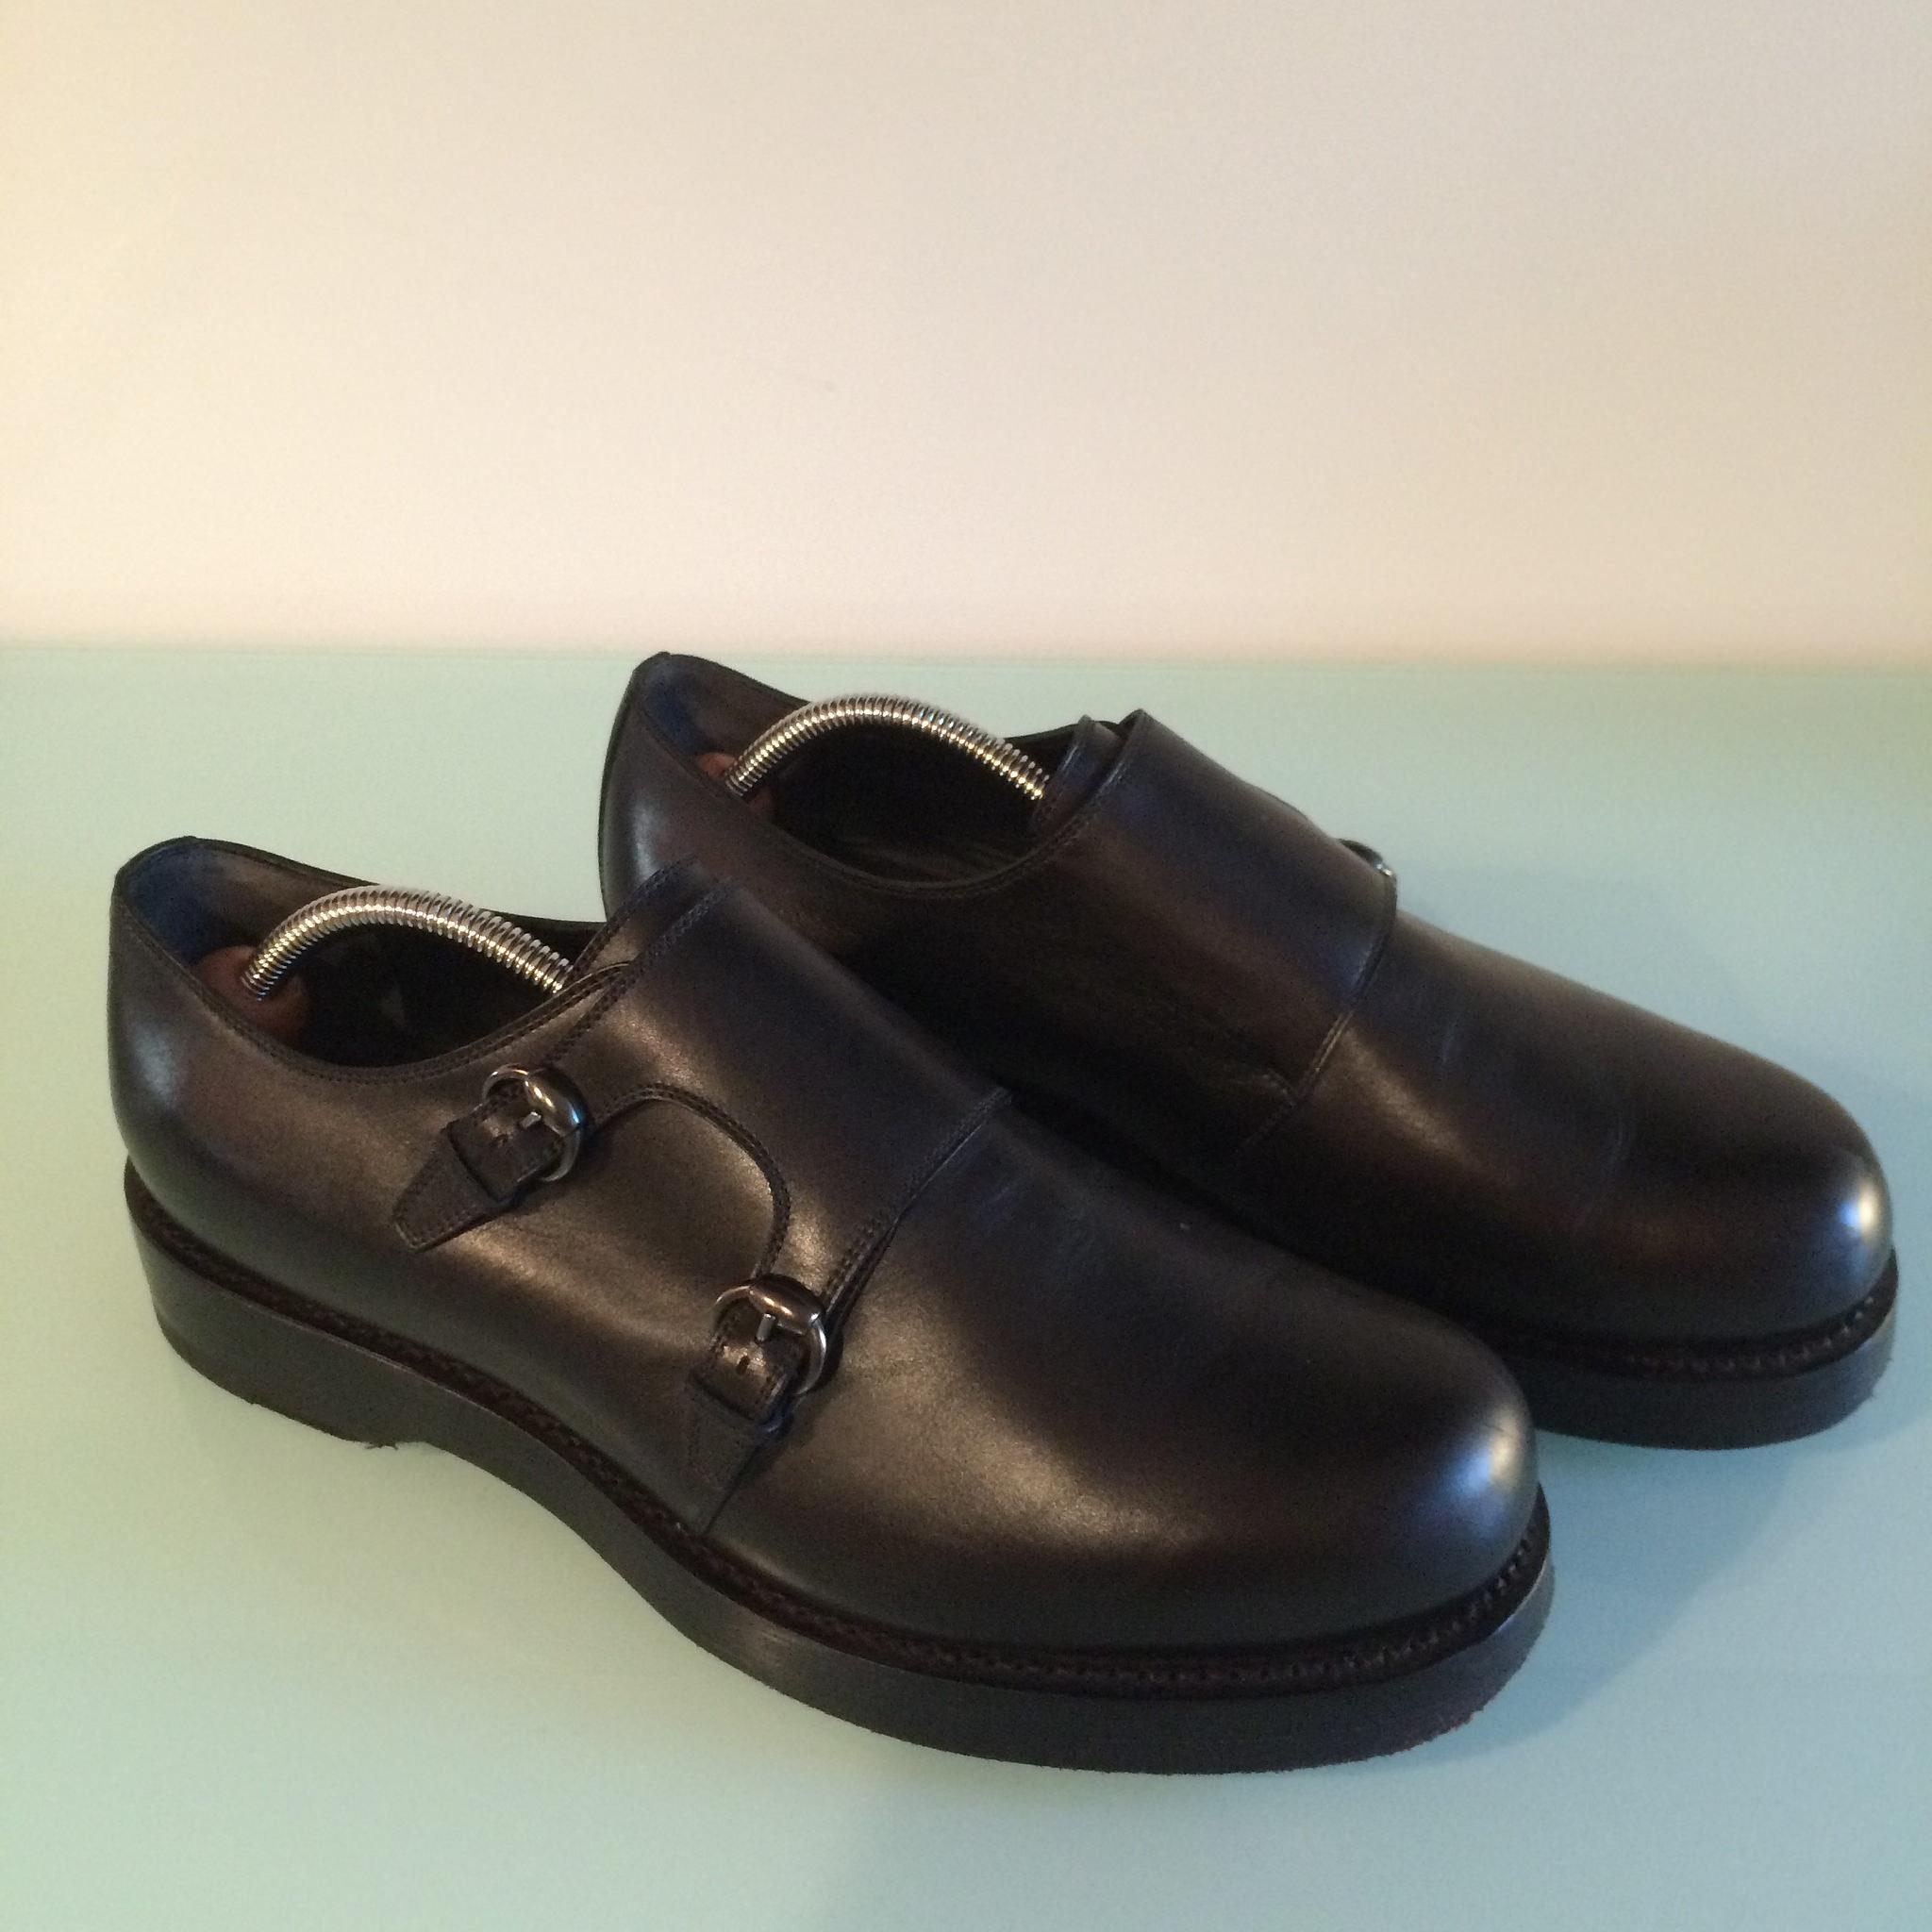 93eea88d779 Gucci goodyear-welt black monkstrap shoes